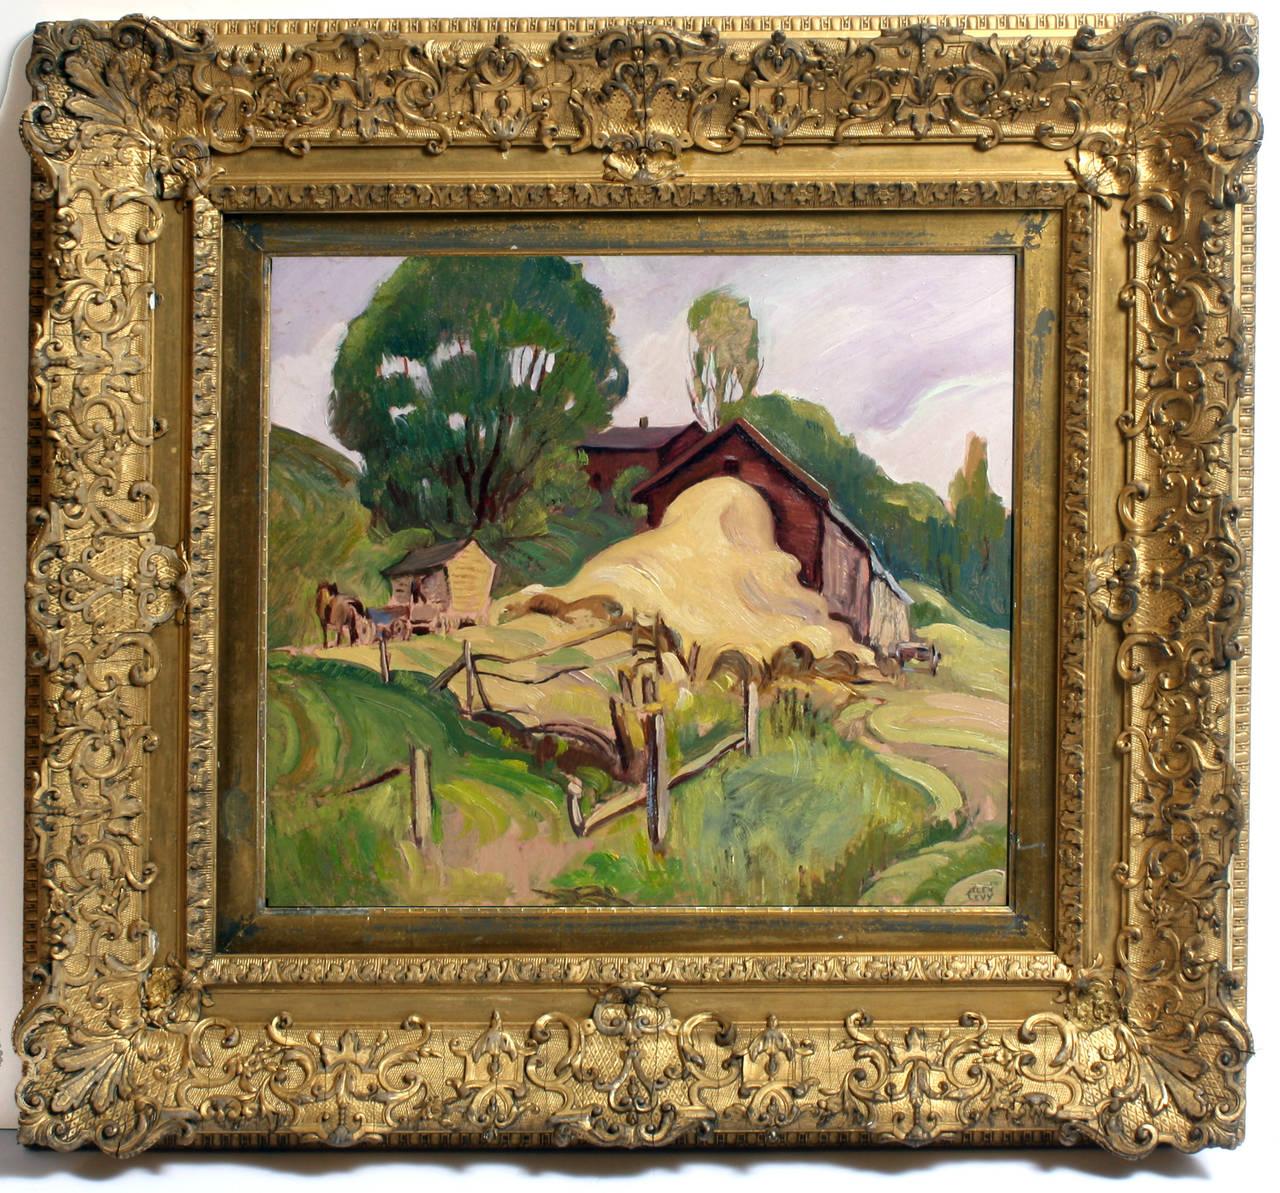 The Haybarn - Painting by Alexander Oscar Levy